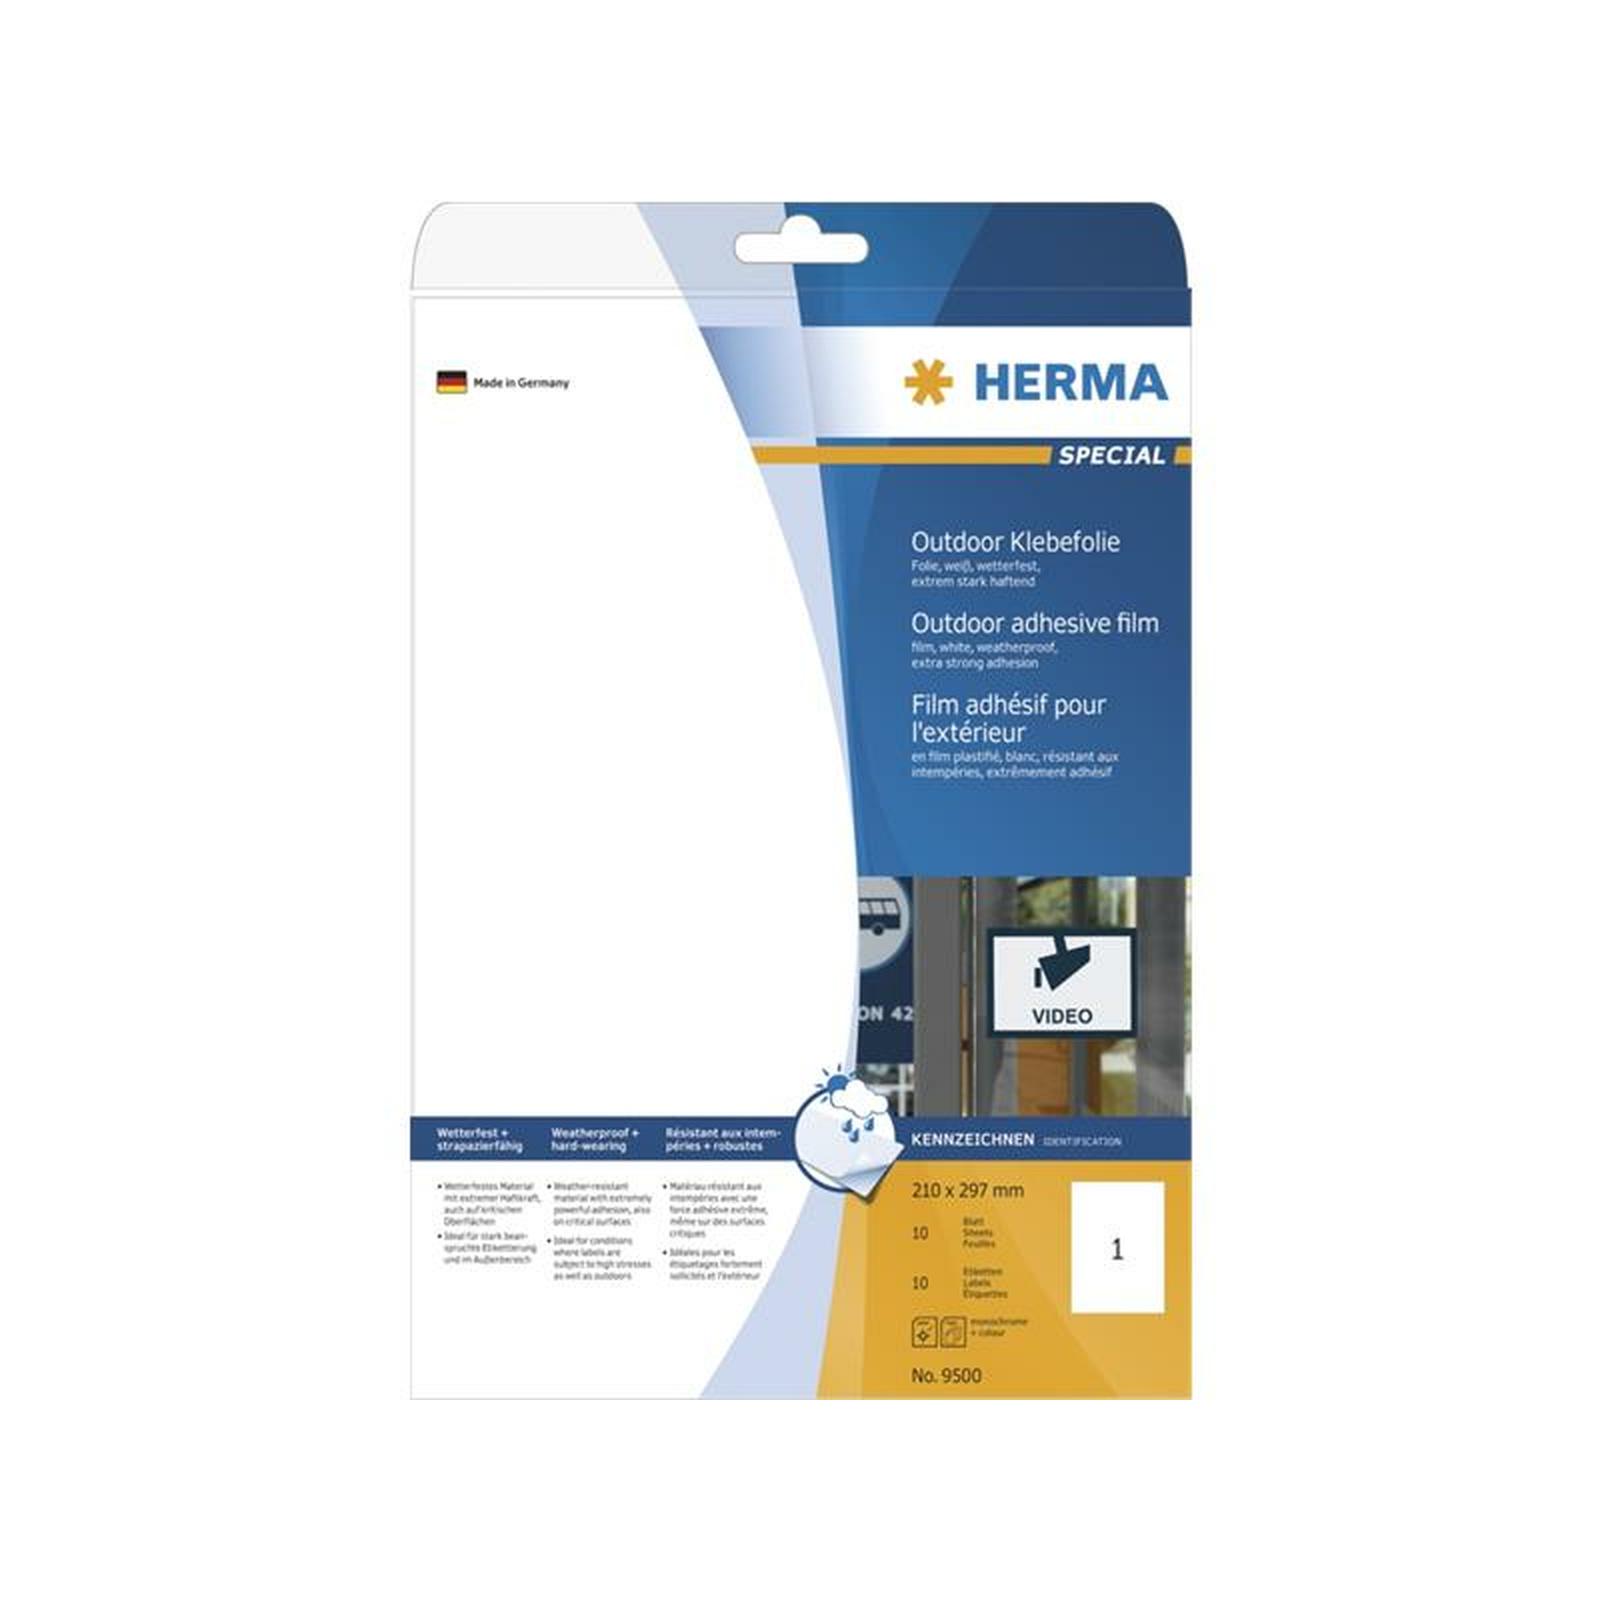 herma etiketten a4 outdoor klebefolie wei 210x297 mm. Black Bedroom Furniture Sets. Home Design Ideas